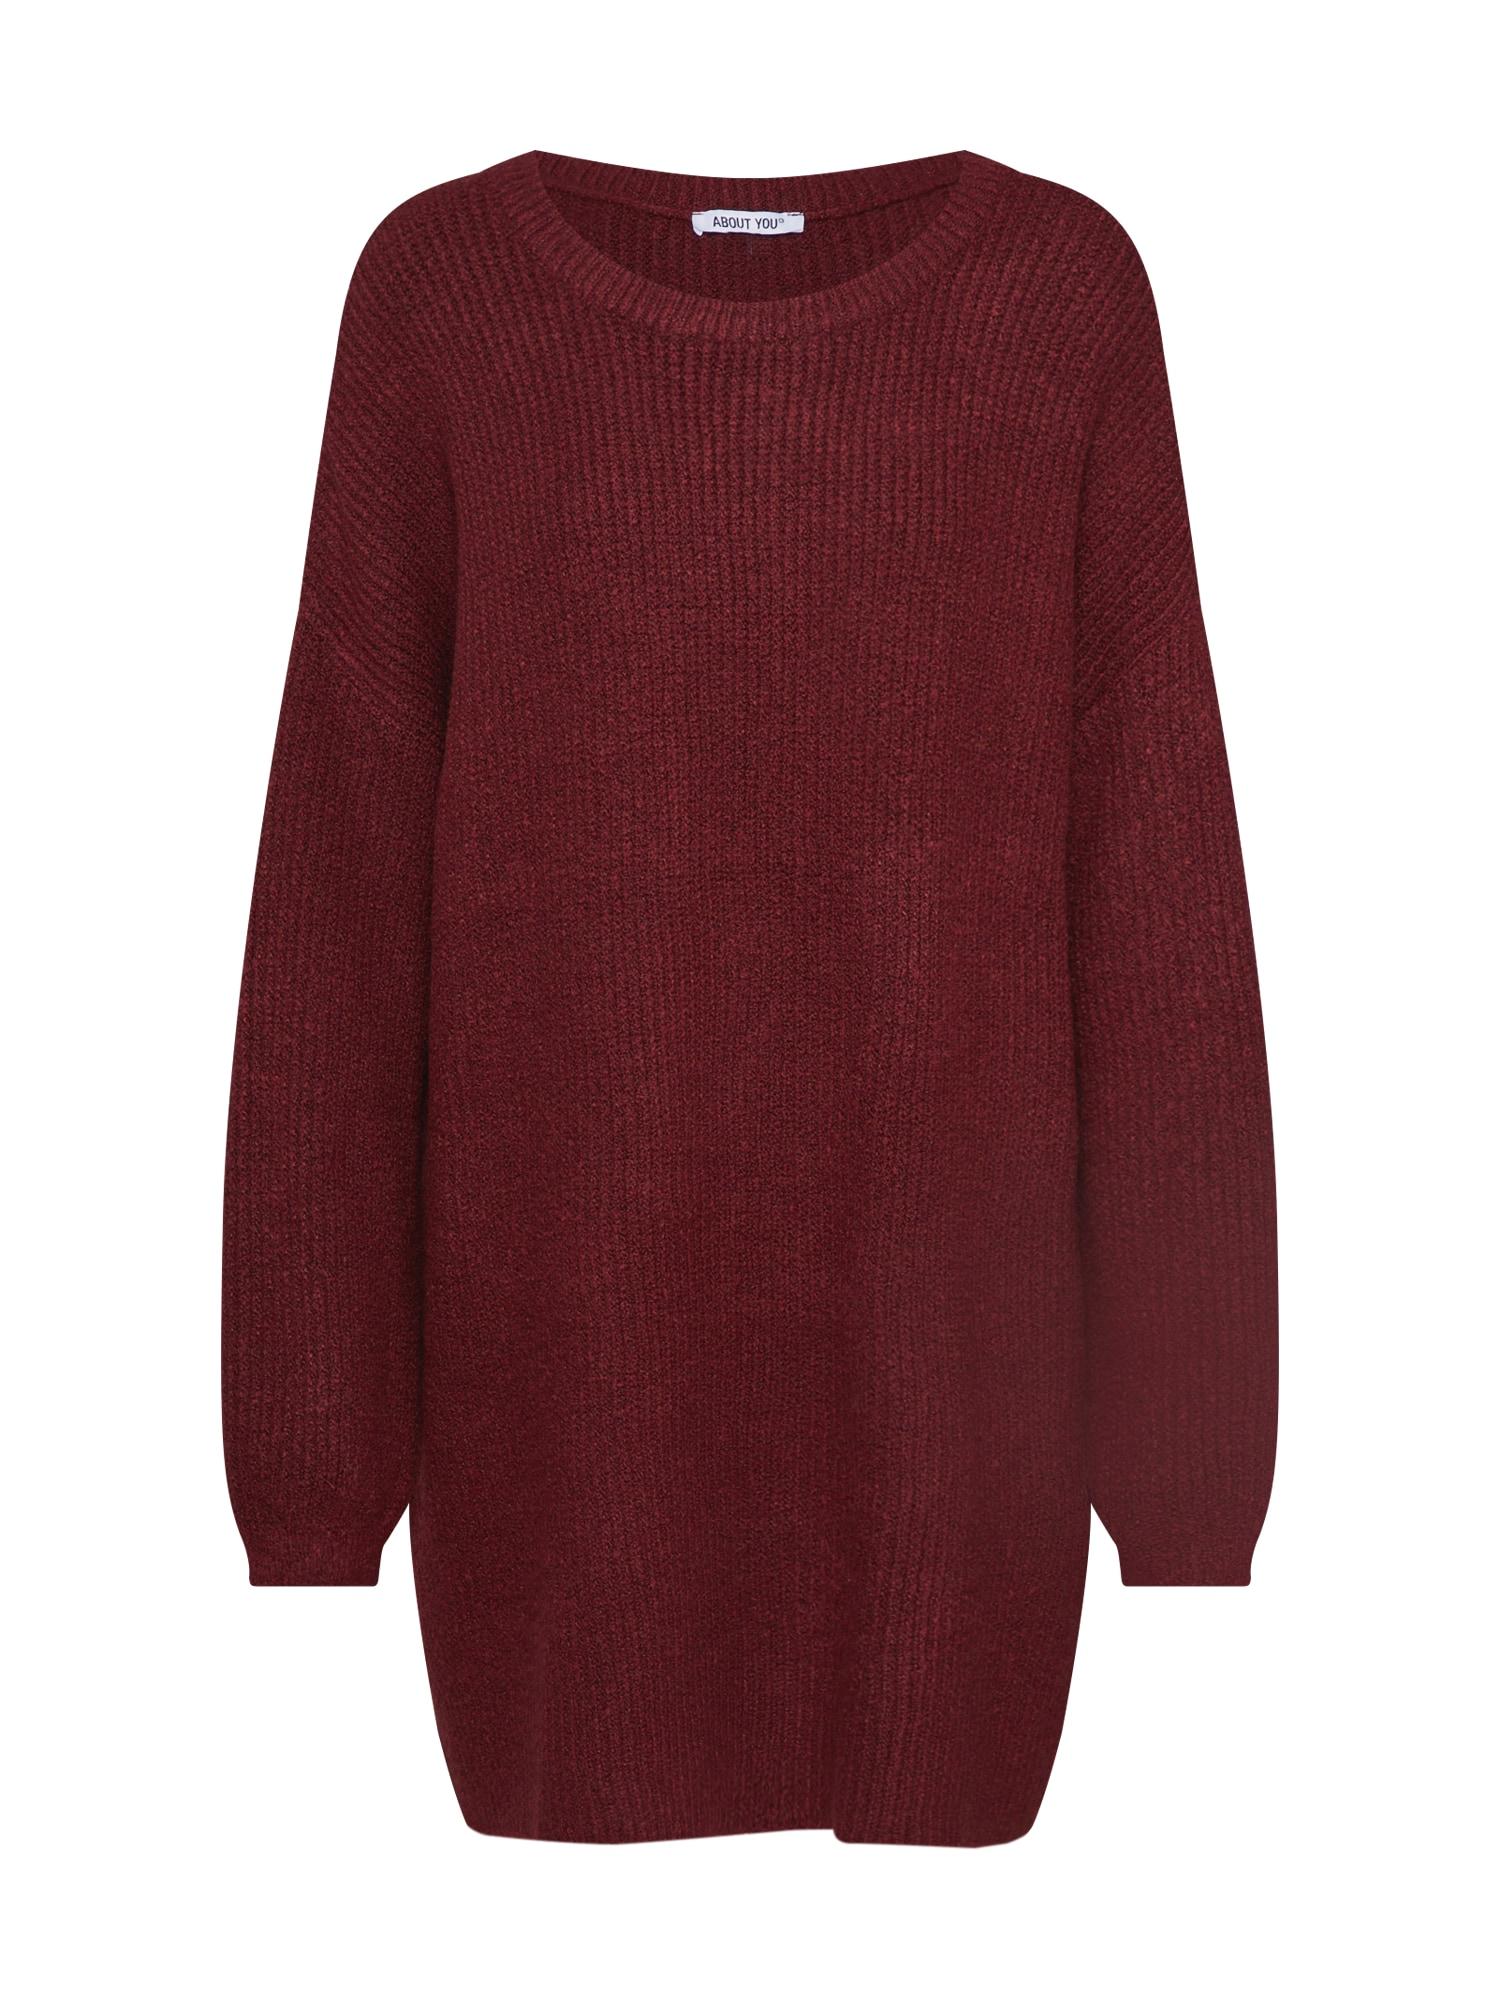 ABOUT YOU Laisvas megztinis 'Mina' vyno raudona spalva